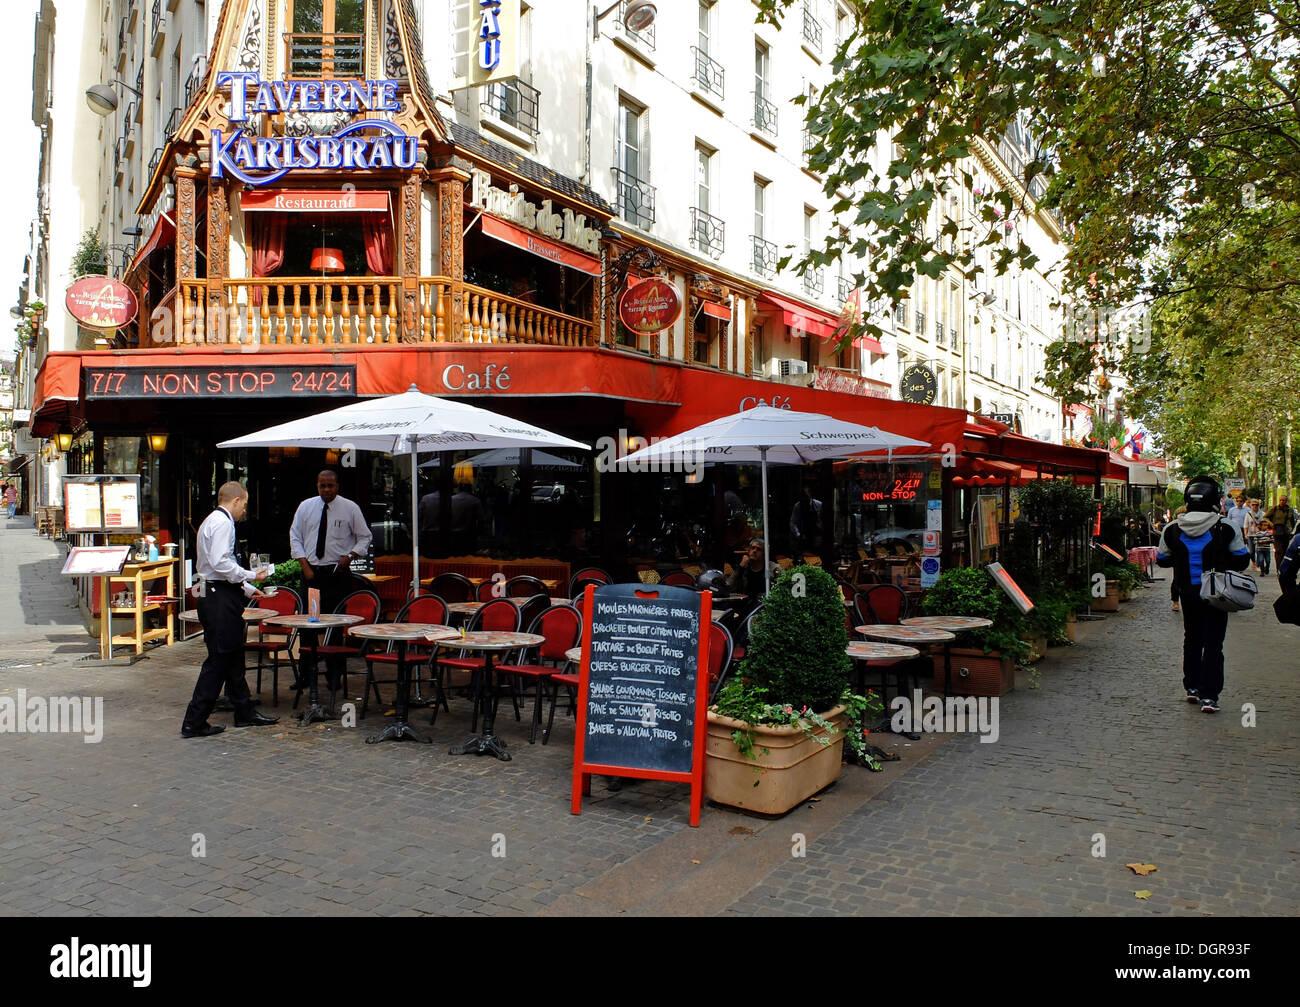 Famous restaurant Taverne Karlsbrau,les Halles,in old Paris,France Stock Photo